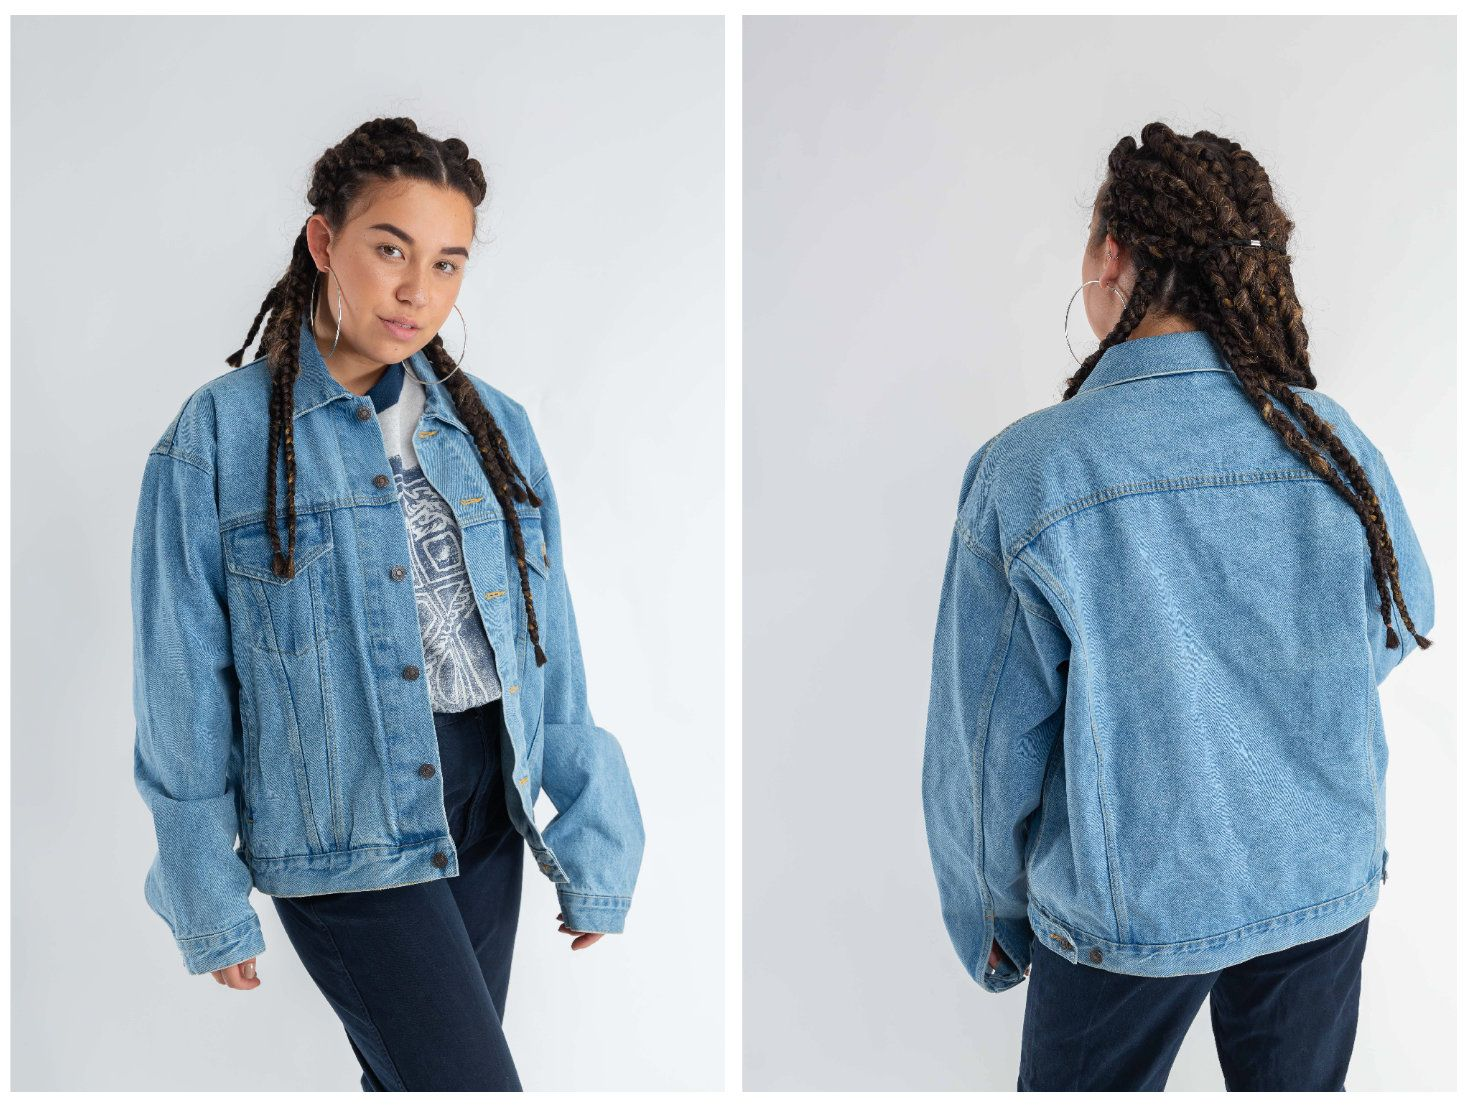 Vintage Oversized Jean Jacket 90s Faded Trucker Denim Jacket Women S Destroyed Denim Jacket Men S Nineties Light Denim Jacket Size L Destroyed Denim Jacket Light Denim Jacket Denim Jacket Women [ 1106 x 1474 Pixel ]